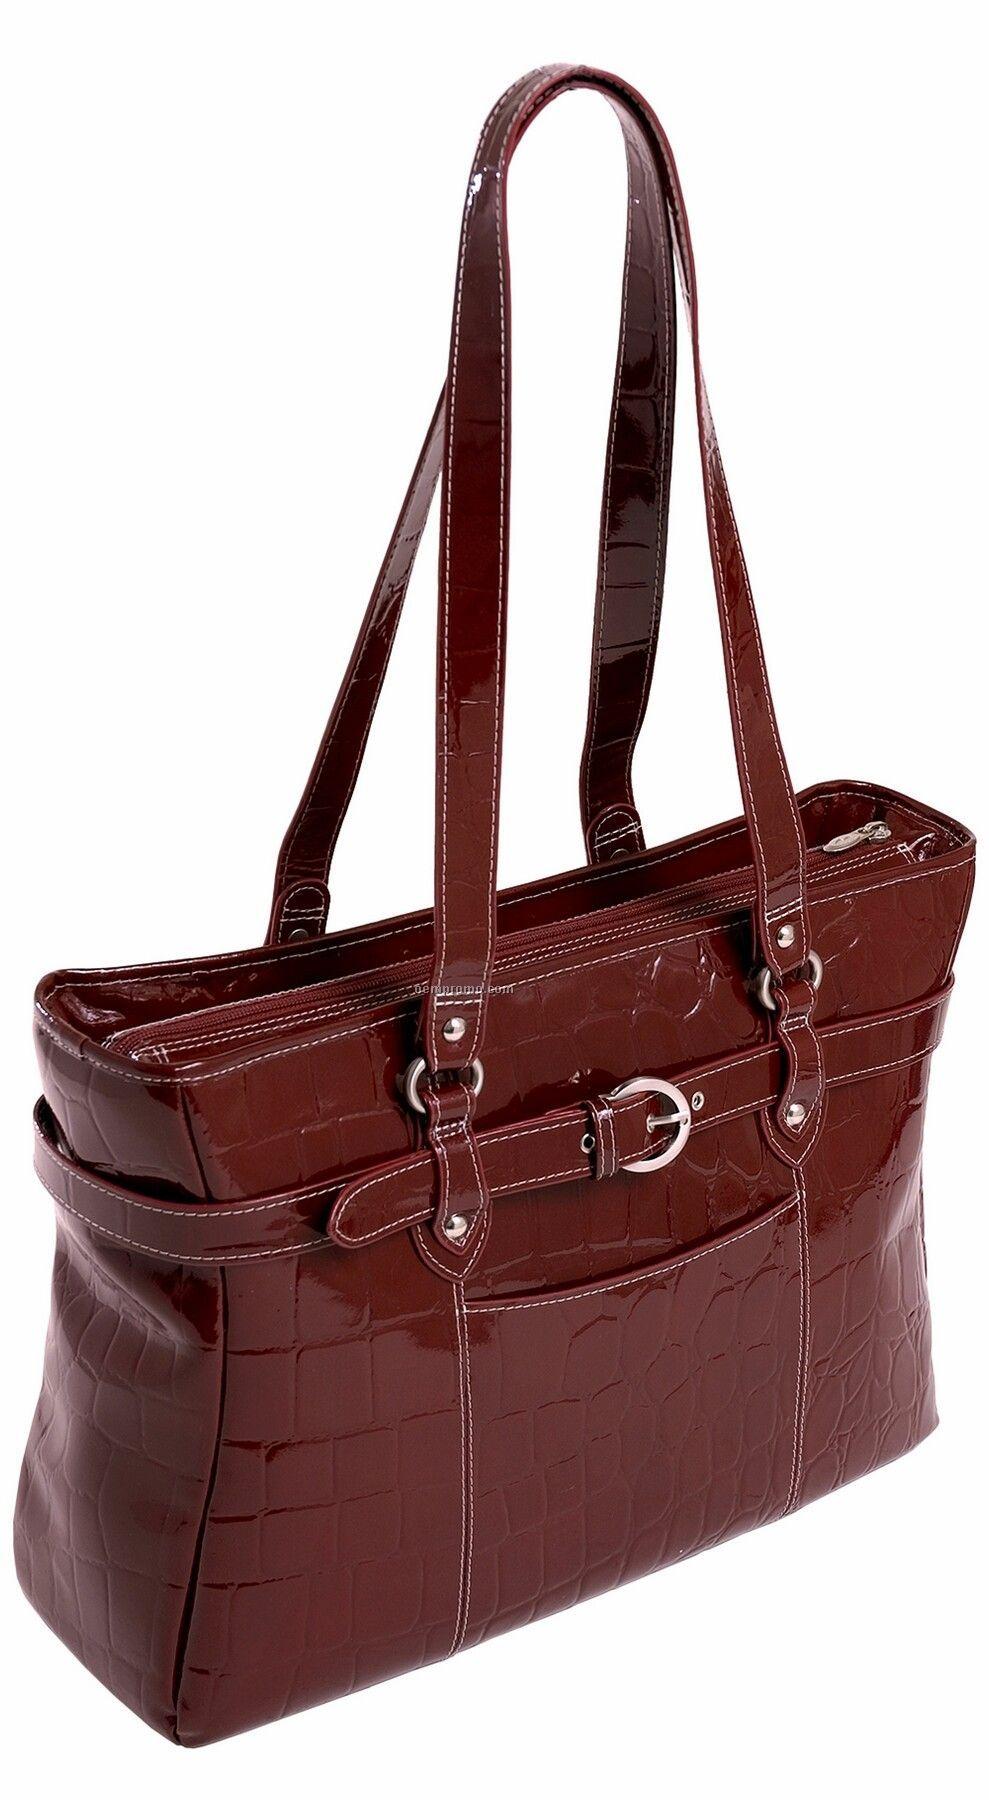 Serra Leather Ladies' Laptop Tote - Cherry Red